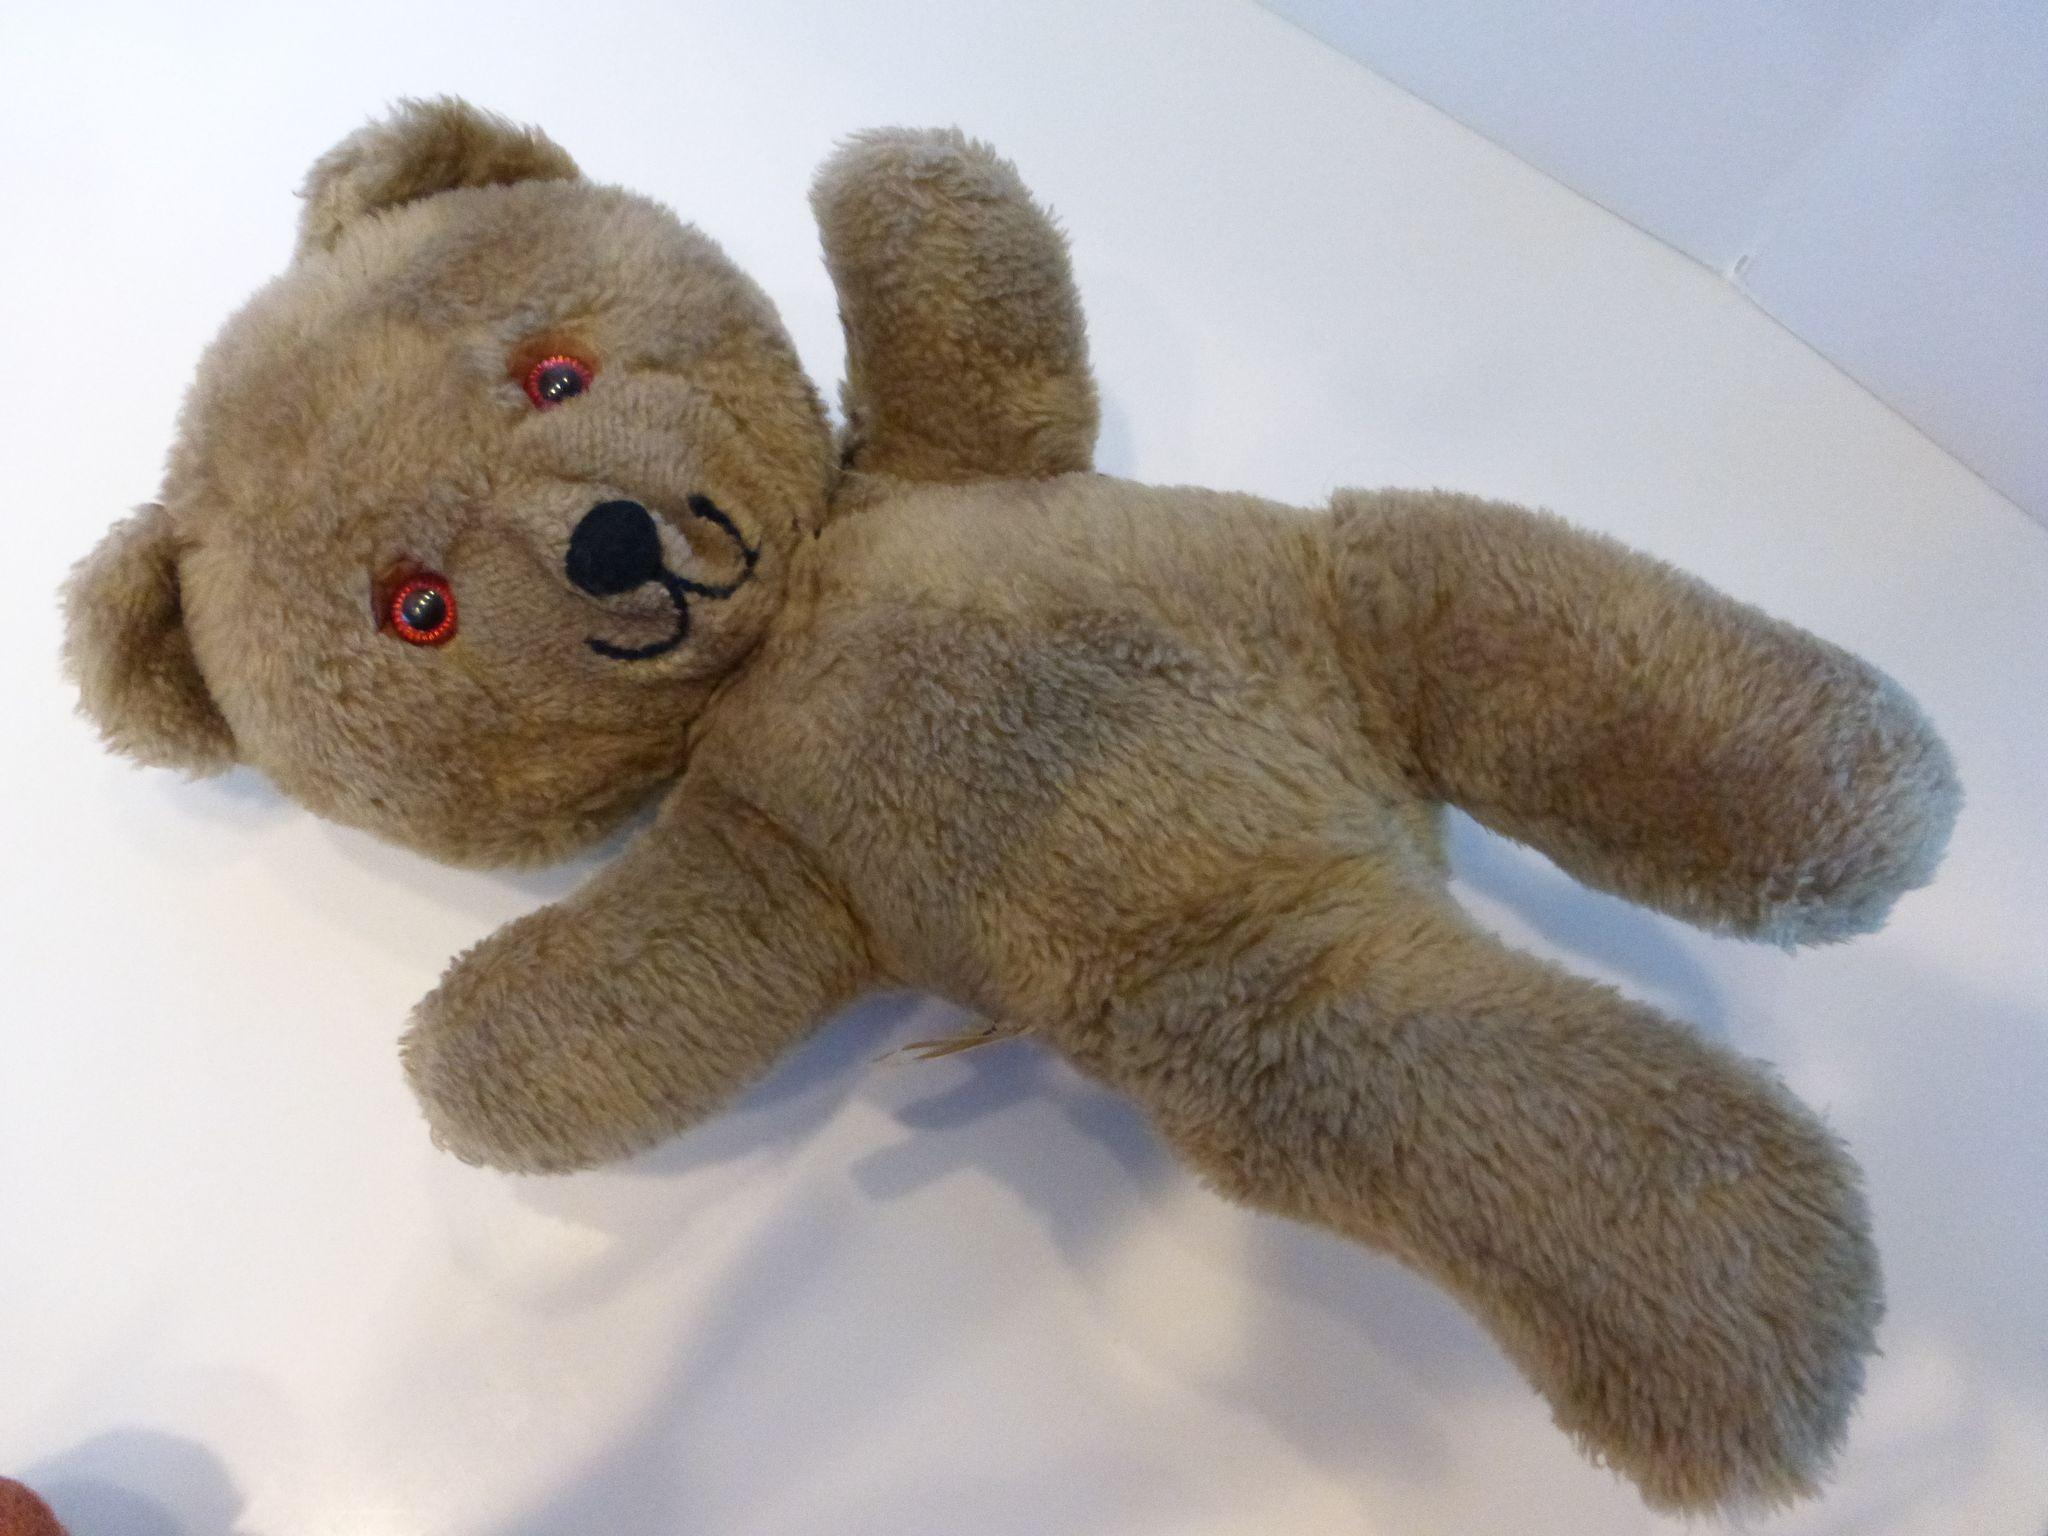 Vintage Knickerbocker Animals of Distinction Teddy Bear